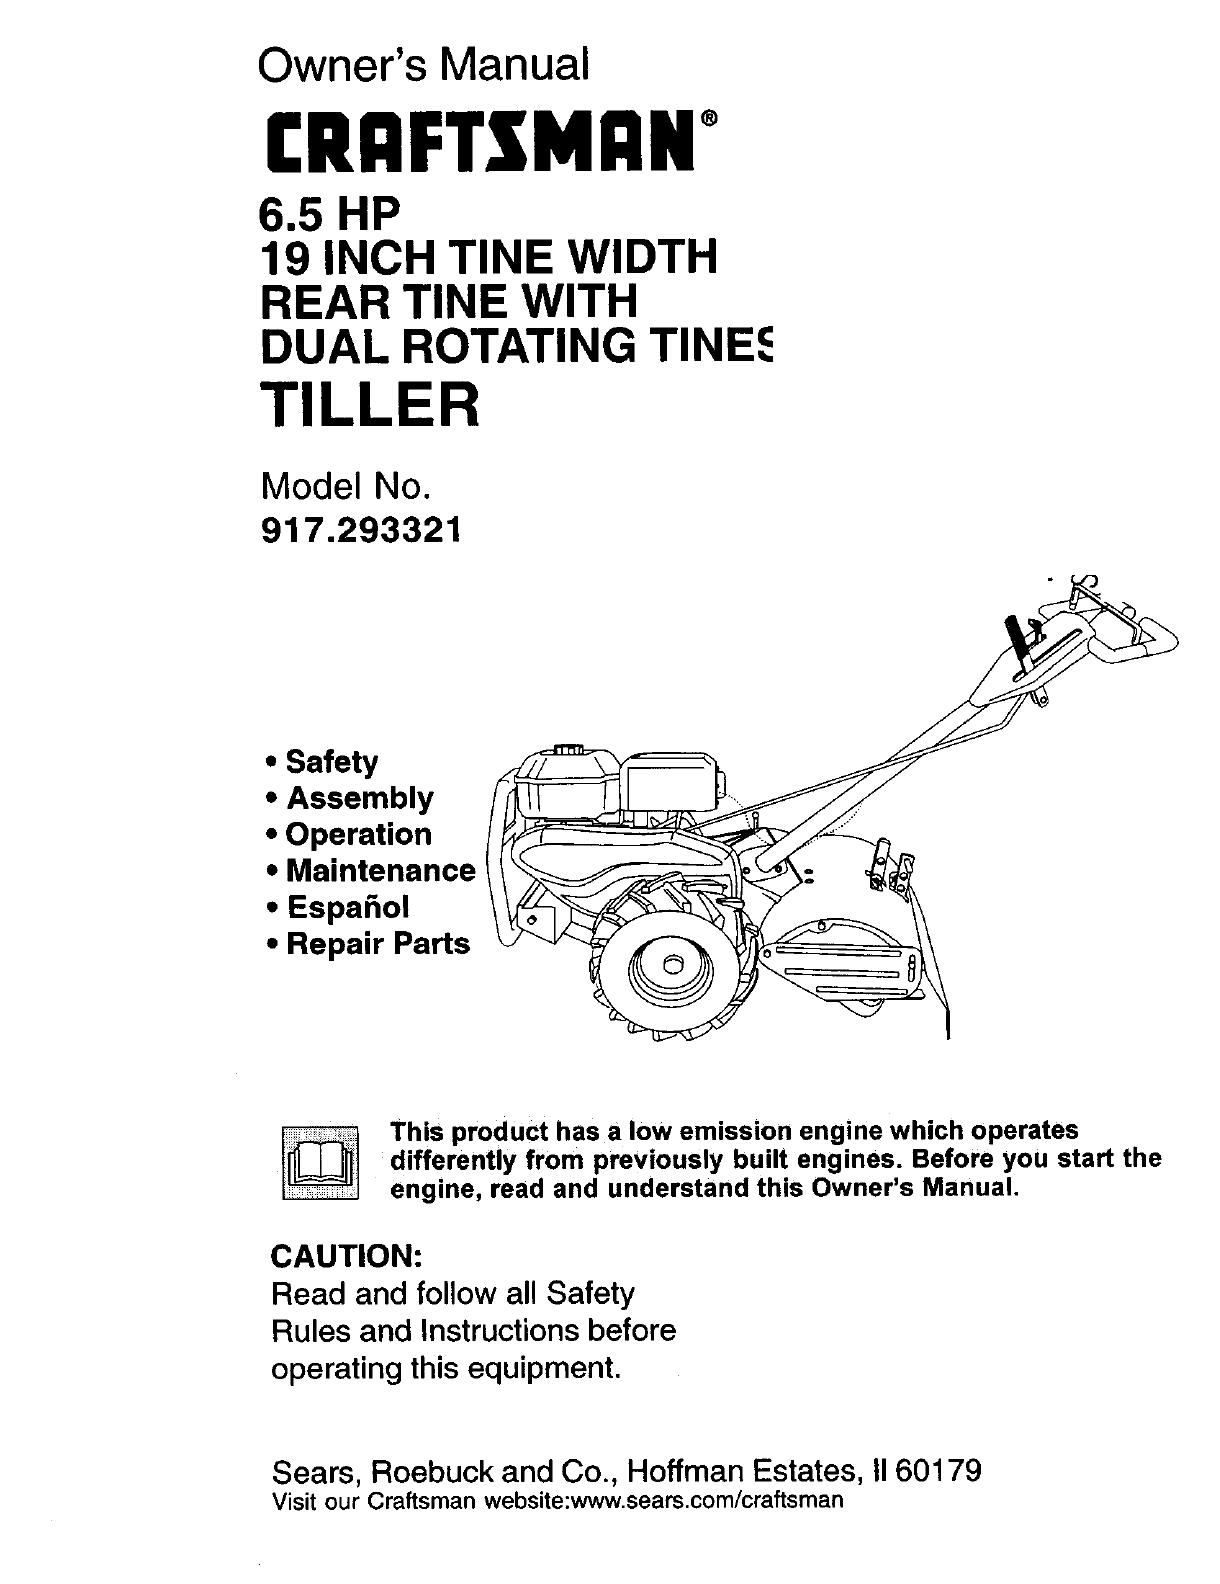 Tiller Engine Diagram   Wiring DiagramWiring Diagrams - AutoScout24